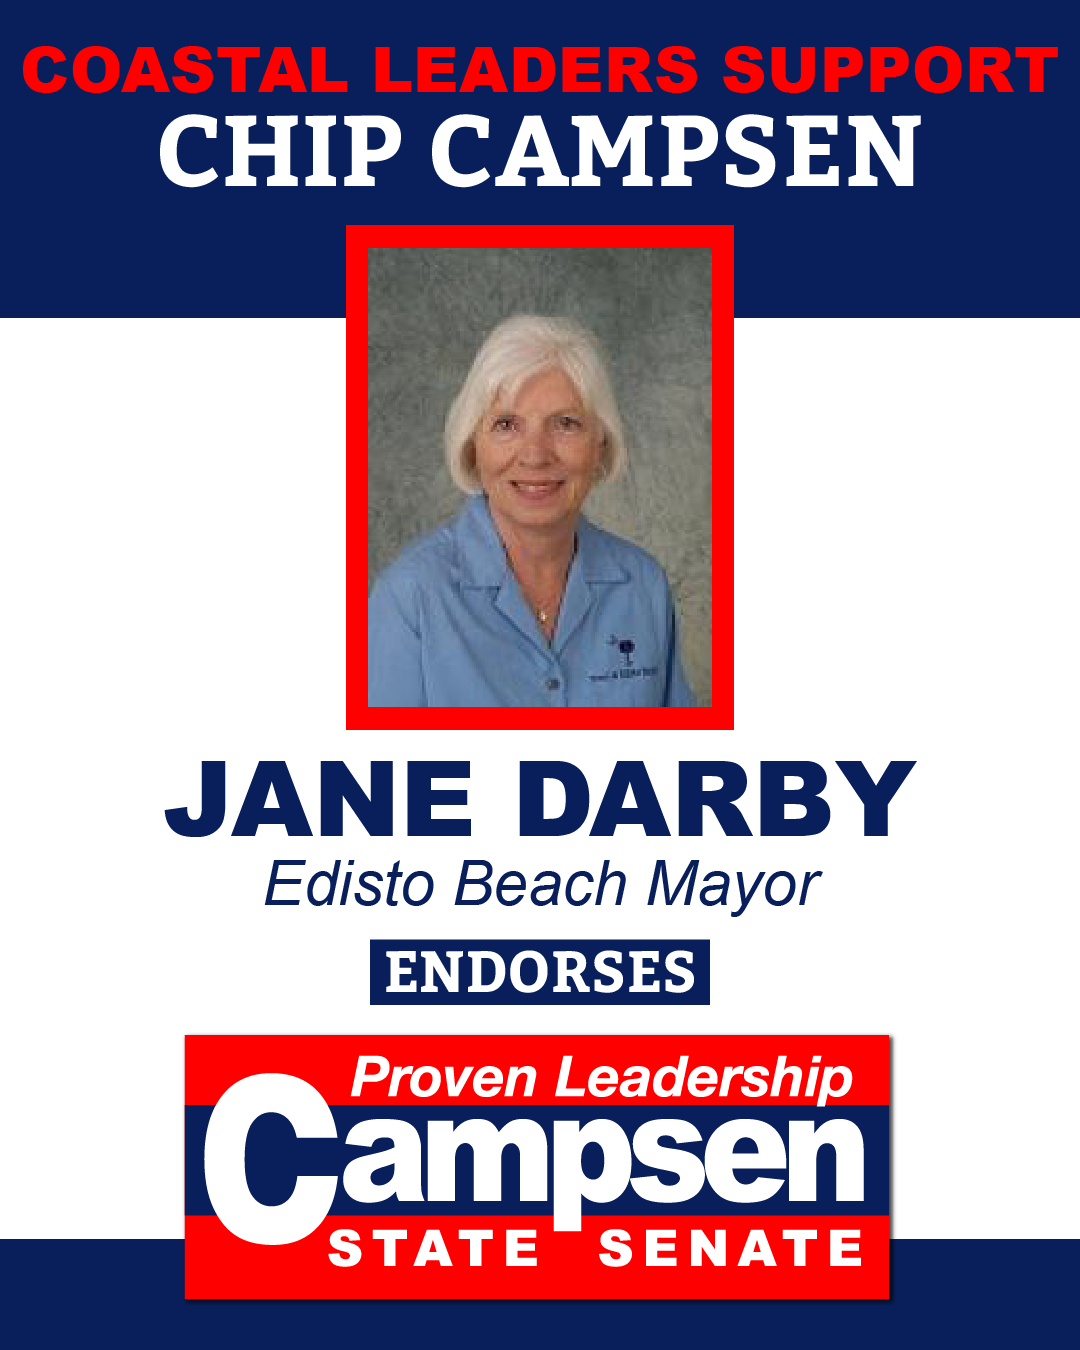 201026_Chip Campsen_Endorsement_ Jane Darby-01